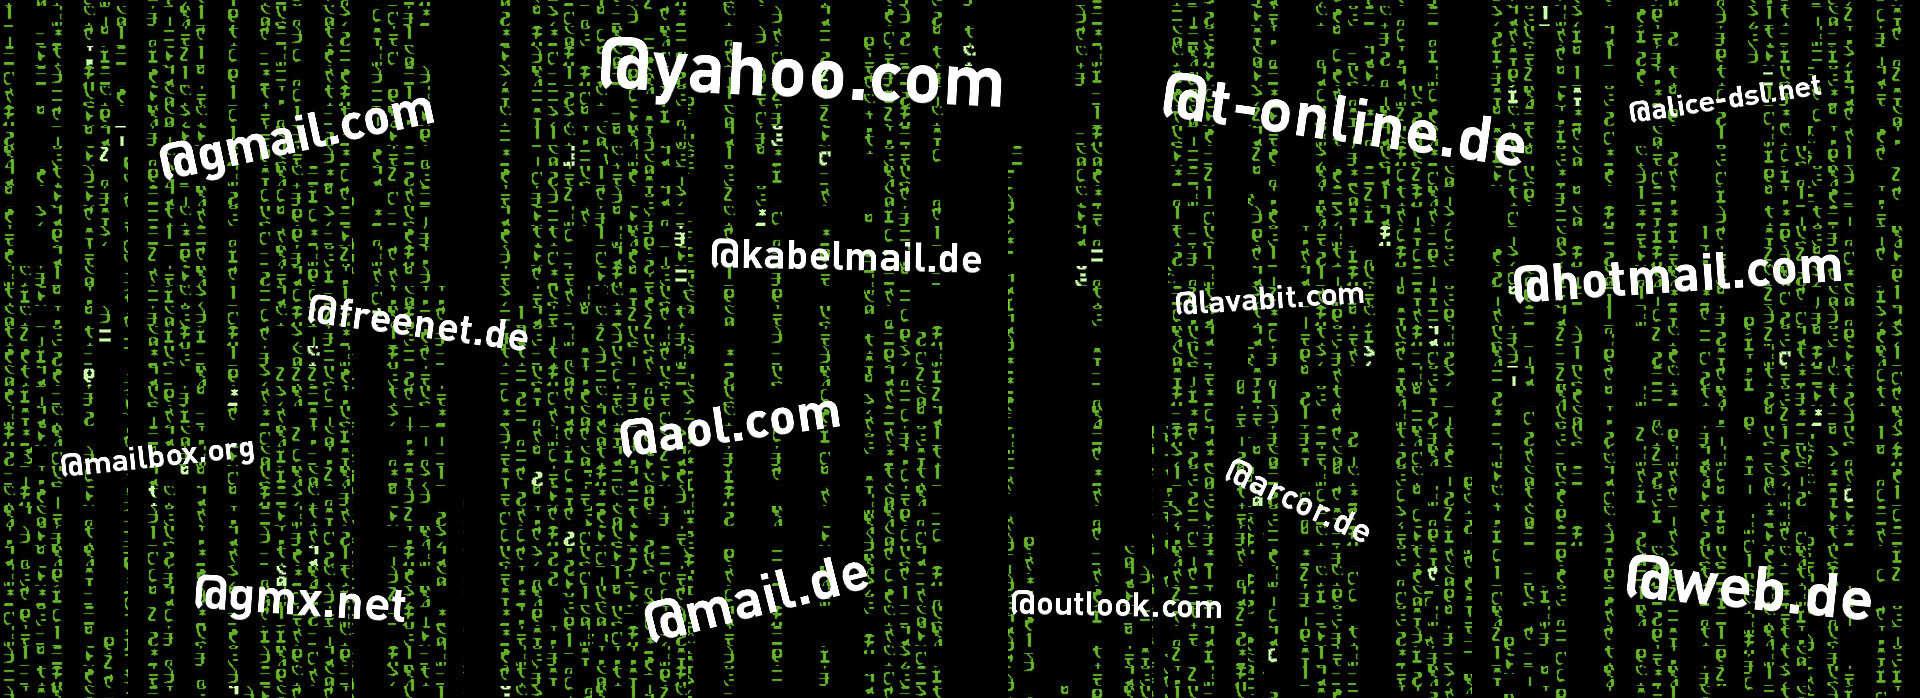 <br /> <b>Notice</b>:  Array to string conversion in <b>/www/htdocs/w012a49b/rotenburger-rundschau.de/administrator/includes/artikeledit.inc.php</b> on line <b>399</b><br /> Array